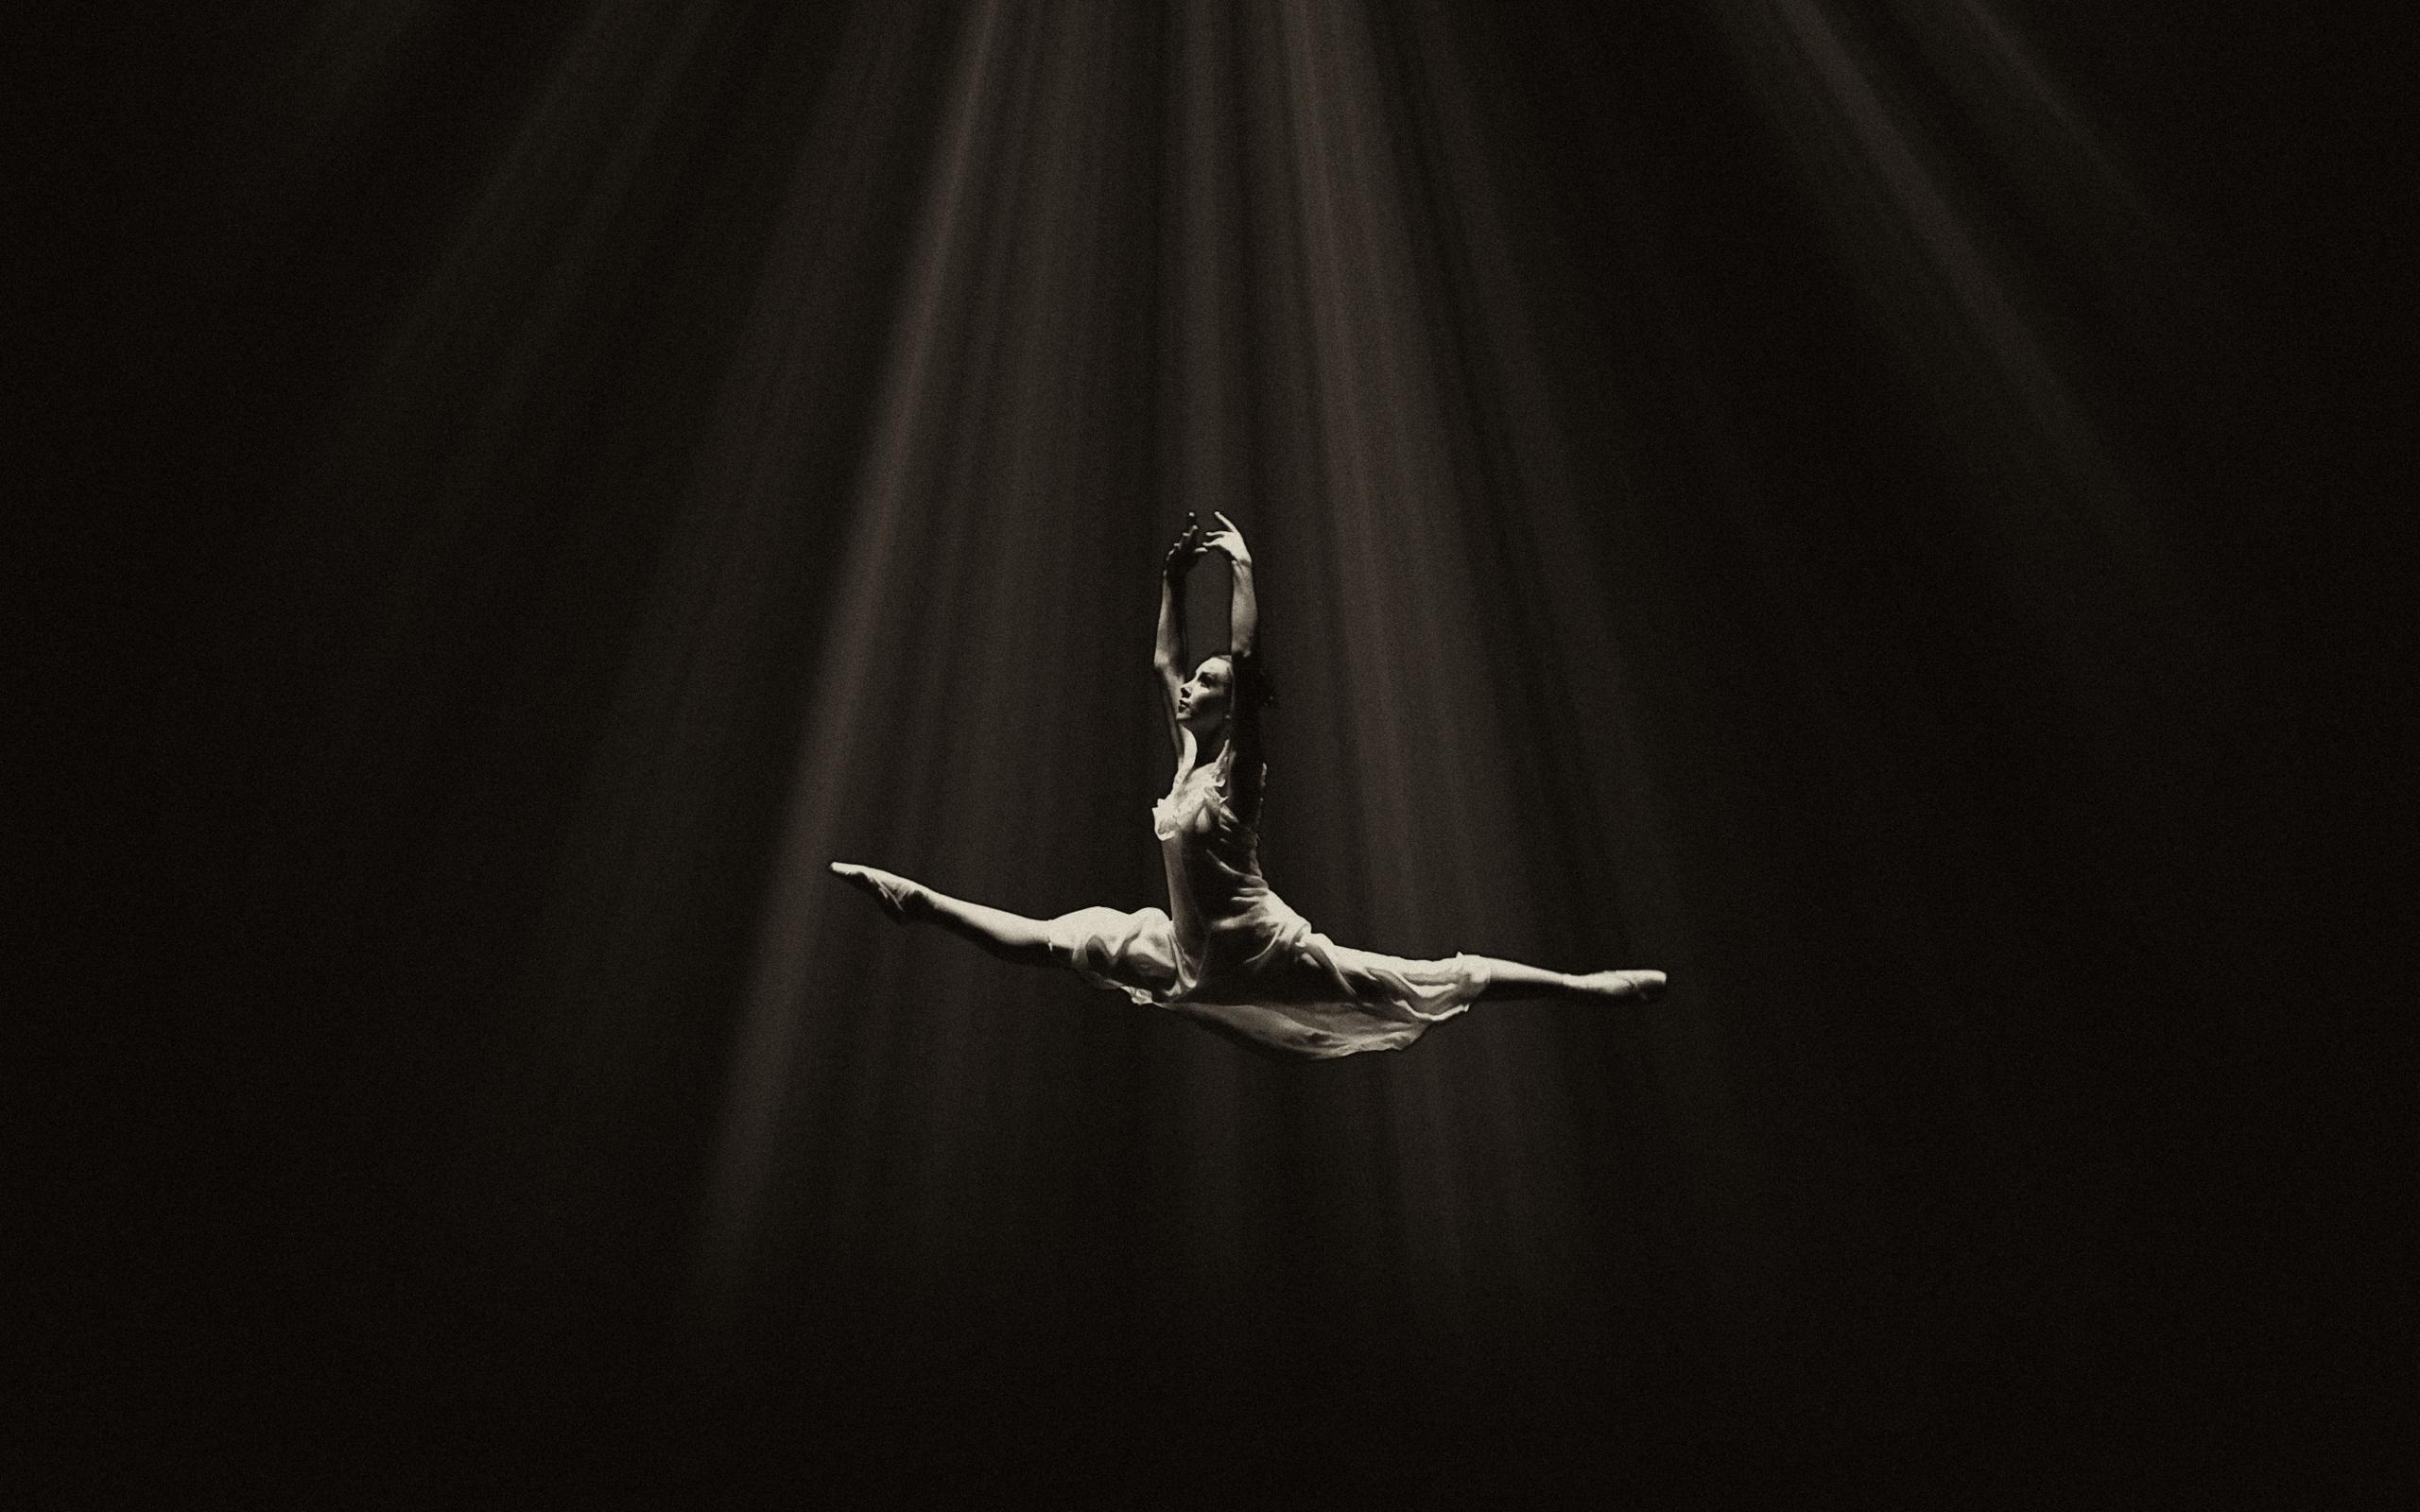 Wallpaper Ballerina Ballet Dance Bw Flight Darkness 2560x1600 Wallpaper Teahub Io